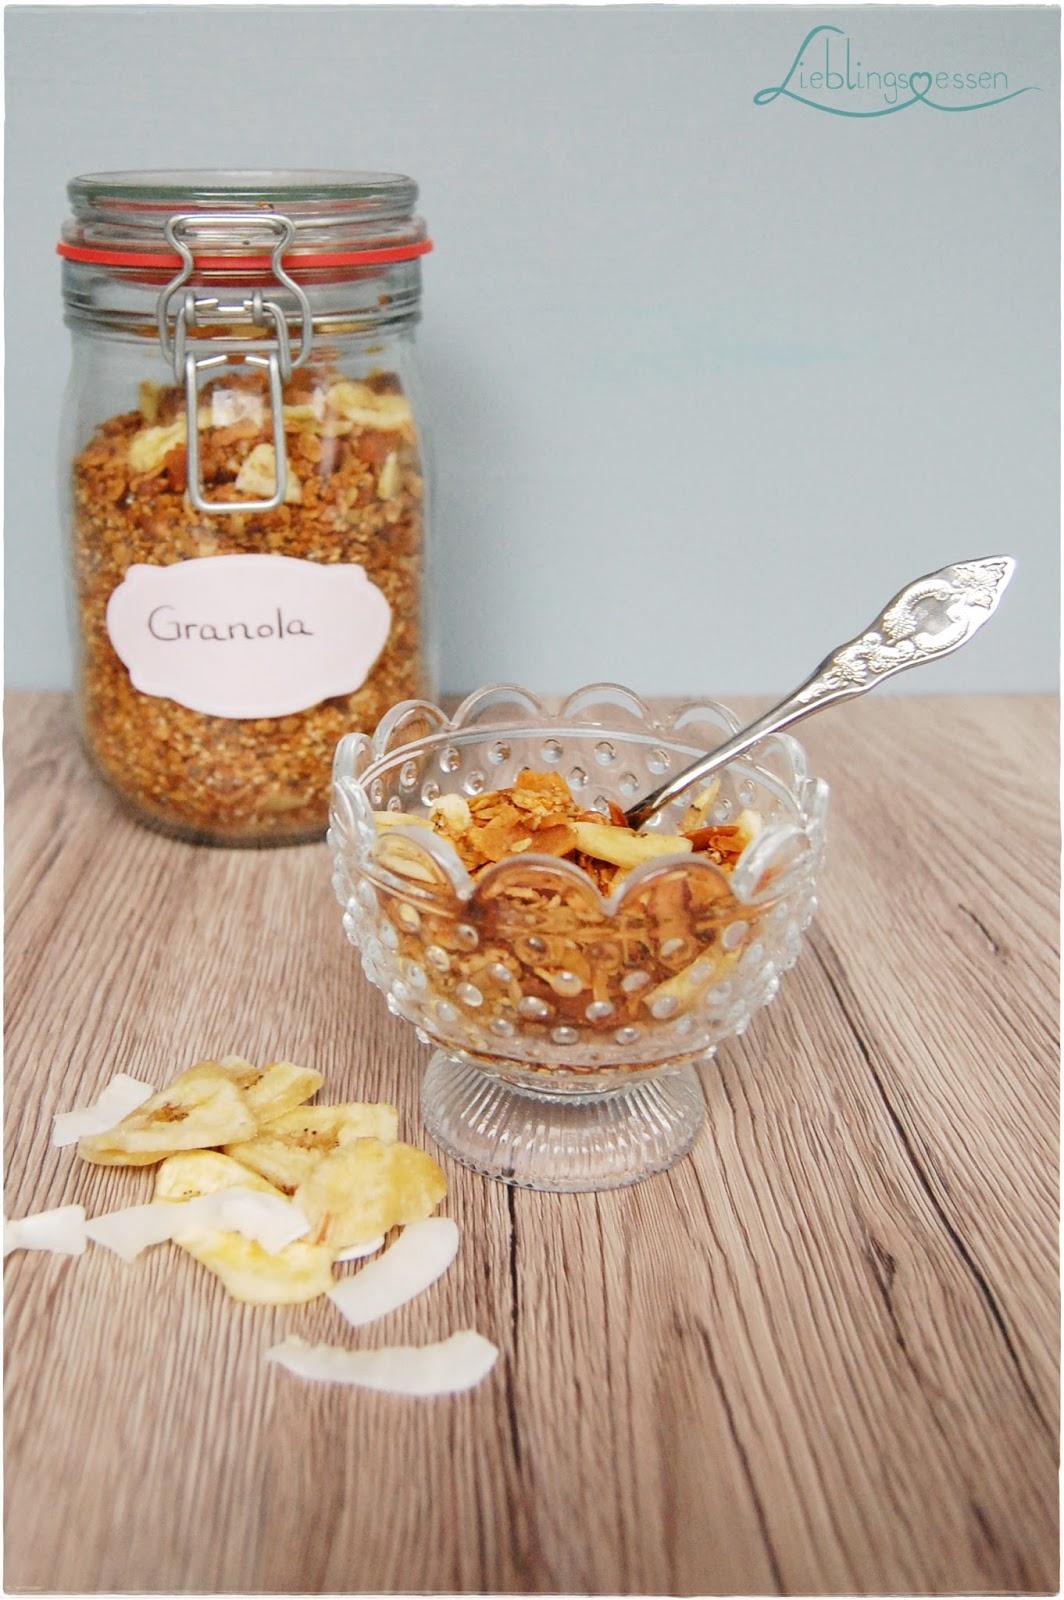 lieblingsessen granola mit kokos und banane. Black Bedroom Furniture Sets. Home Design Ideas